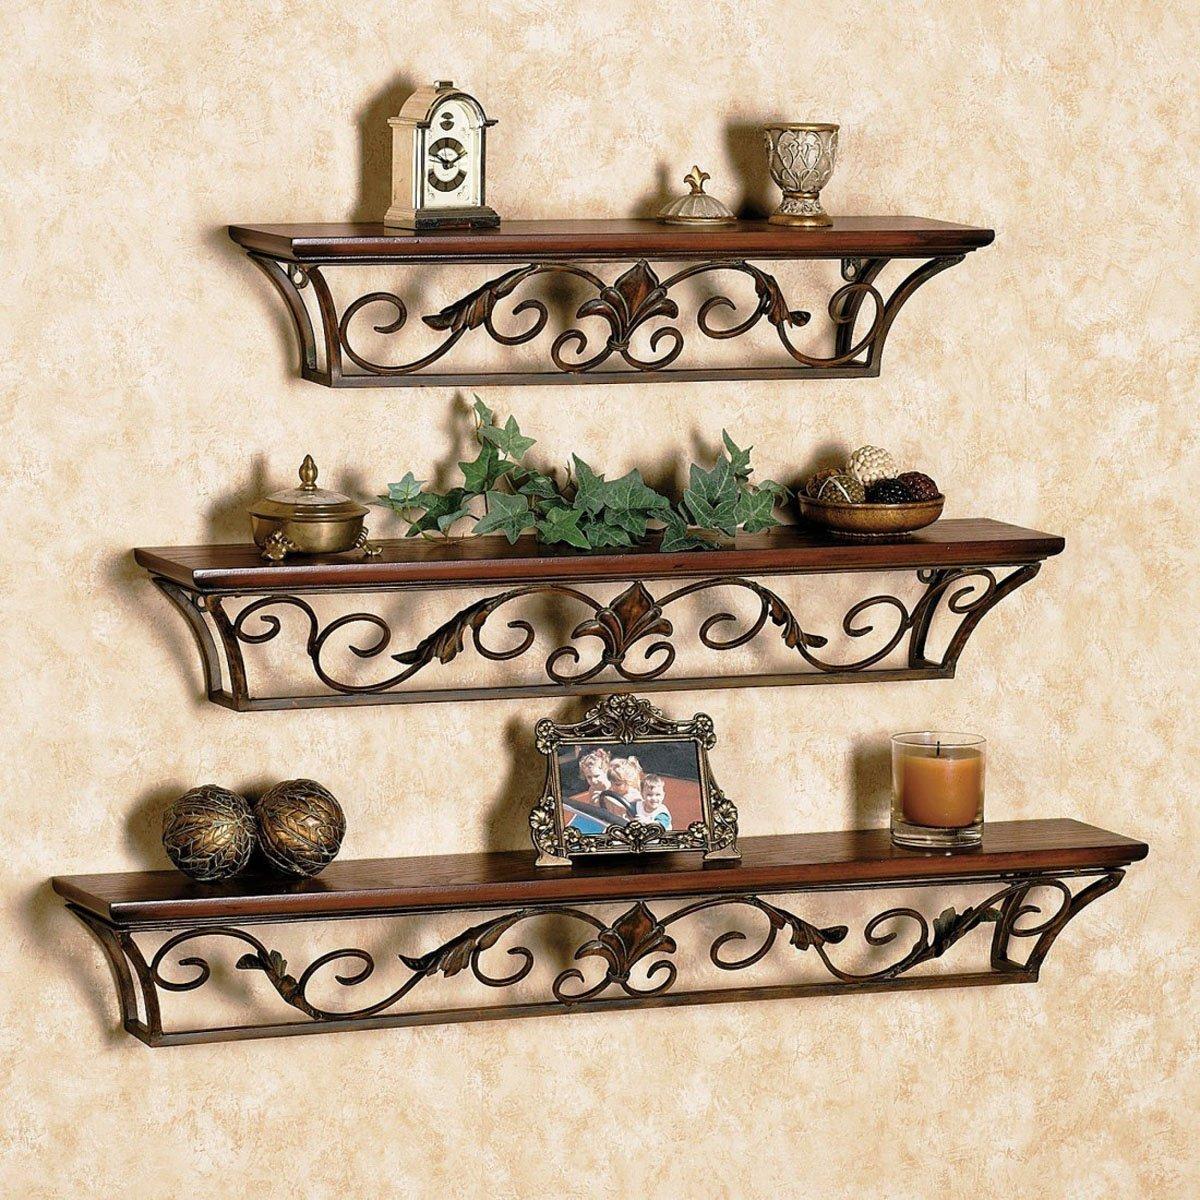 glamorous wrought iron kitchen wall shelves | 15 Beautiful Ways of Using Iron Wall Decor at Home ...